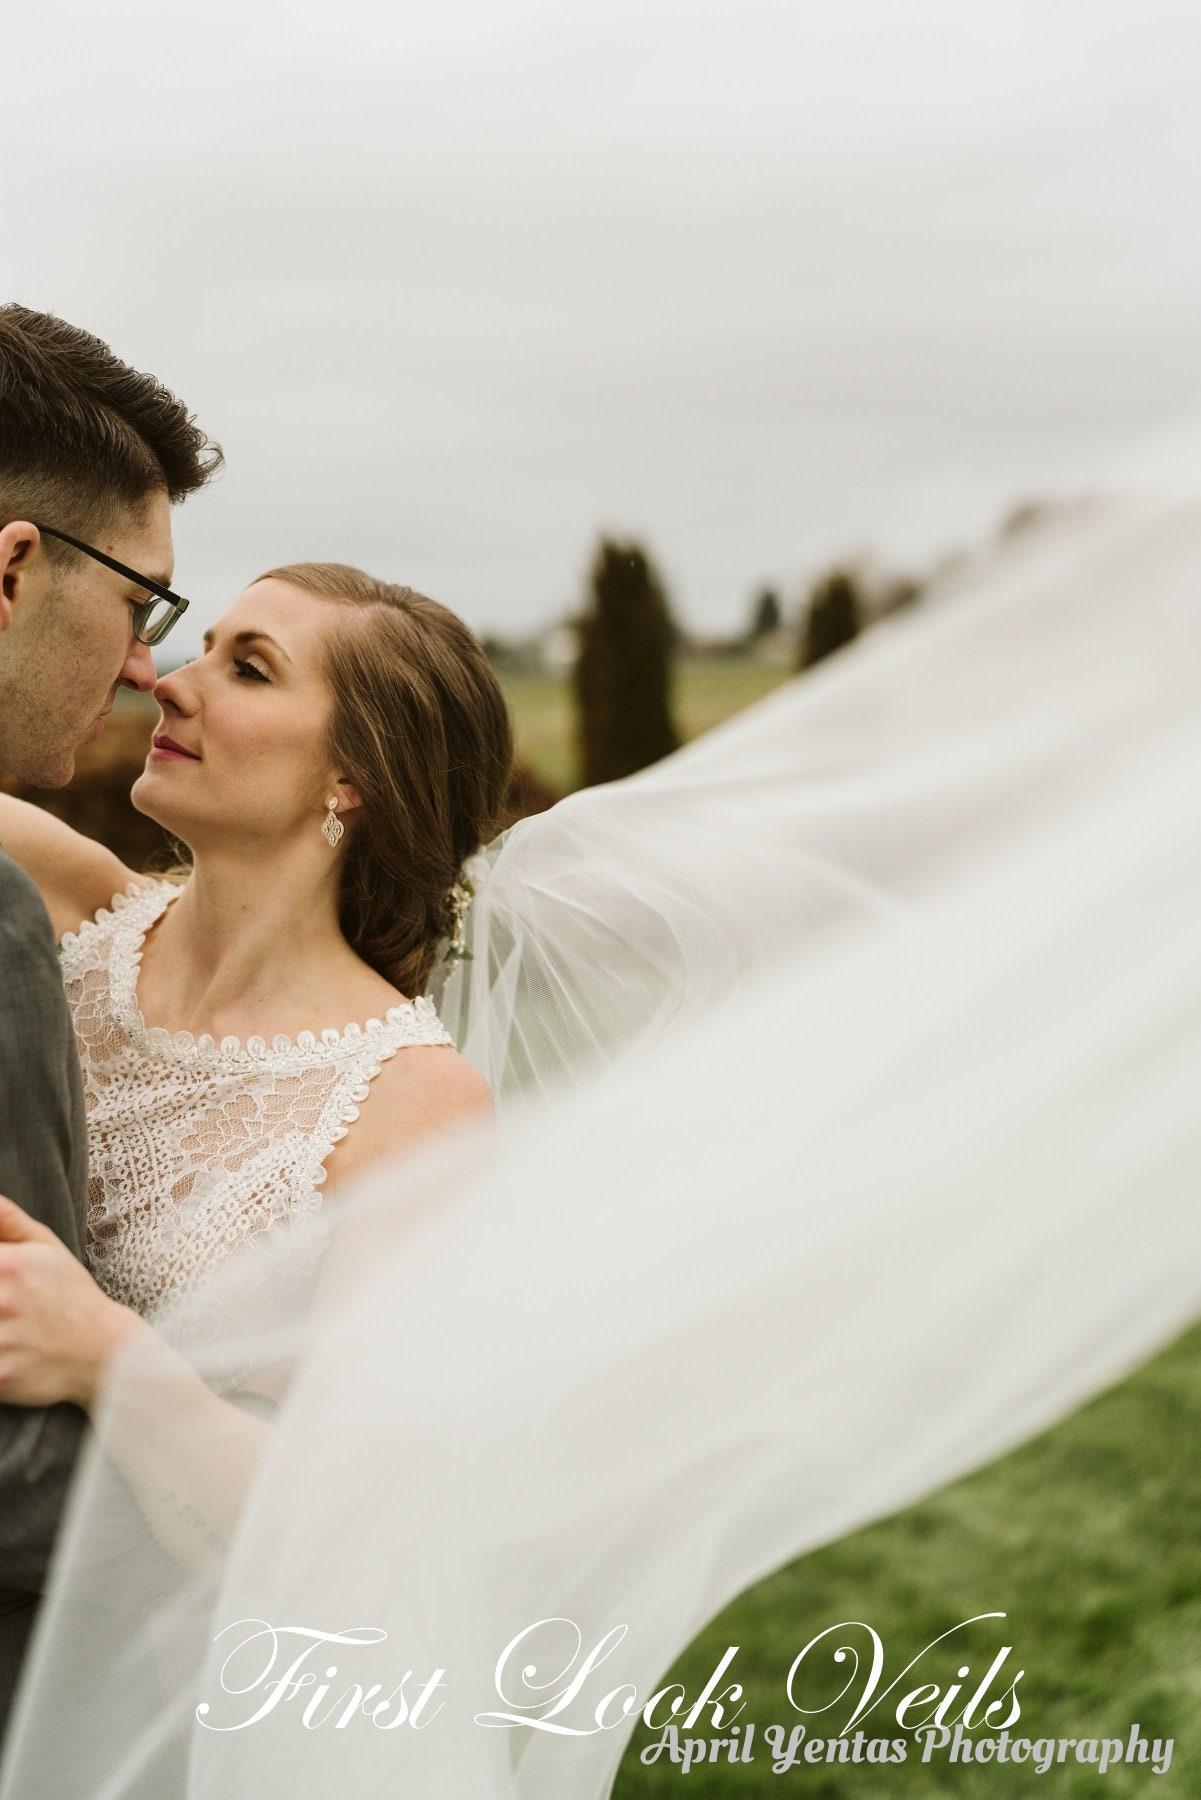 Wedding Veil Bridal Vail Ballet Vale 30 Inch Drop Veil